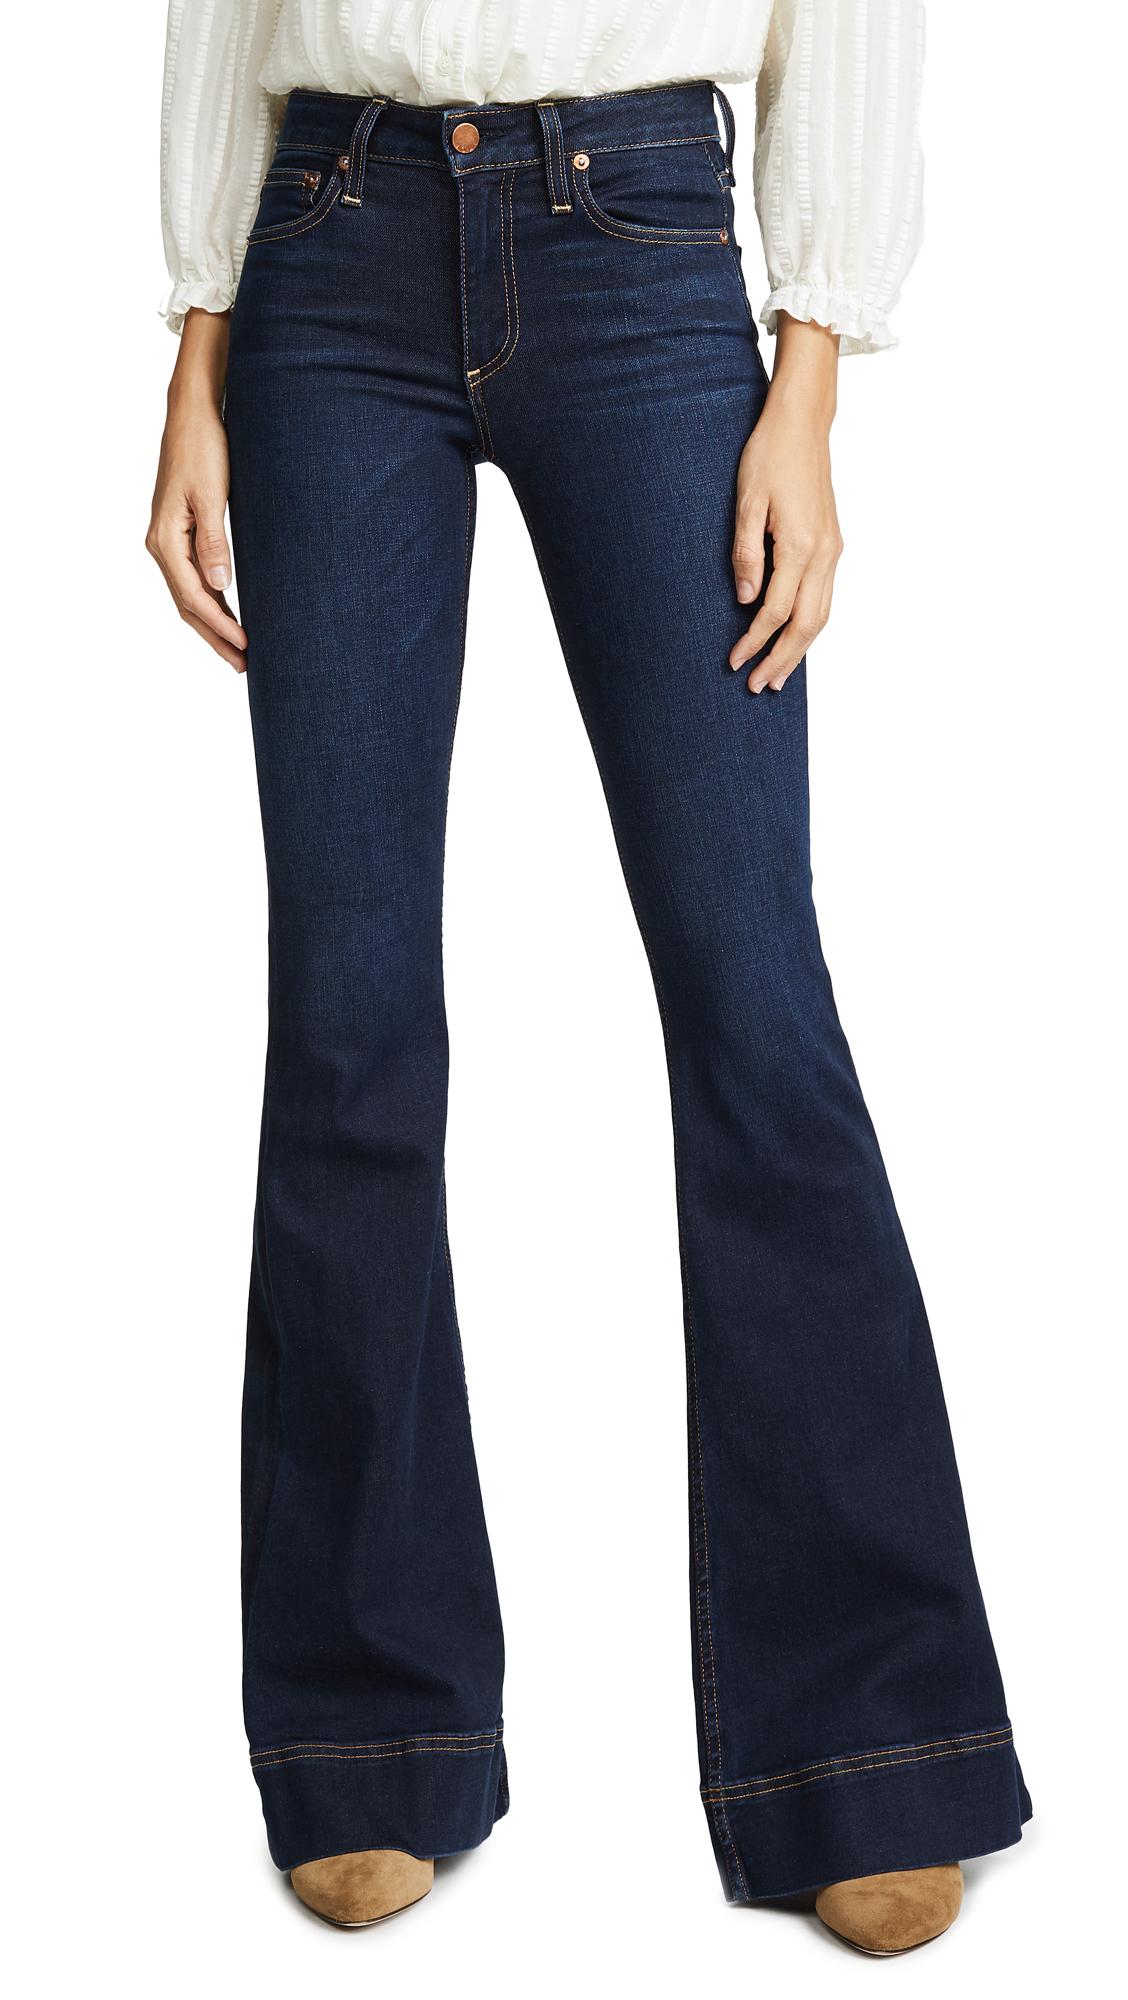 AO. LA by alice + olivia Beautiful Bell Jeans